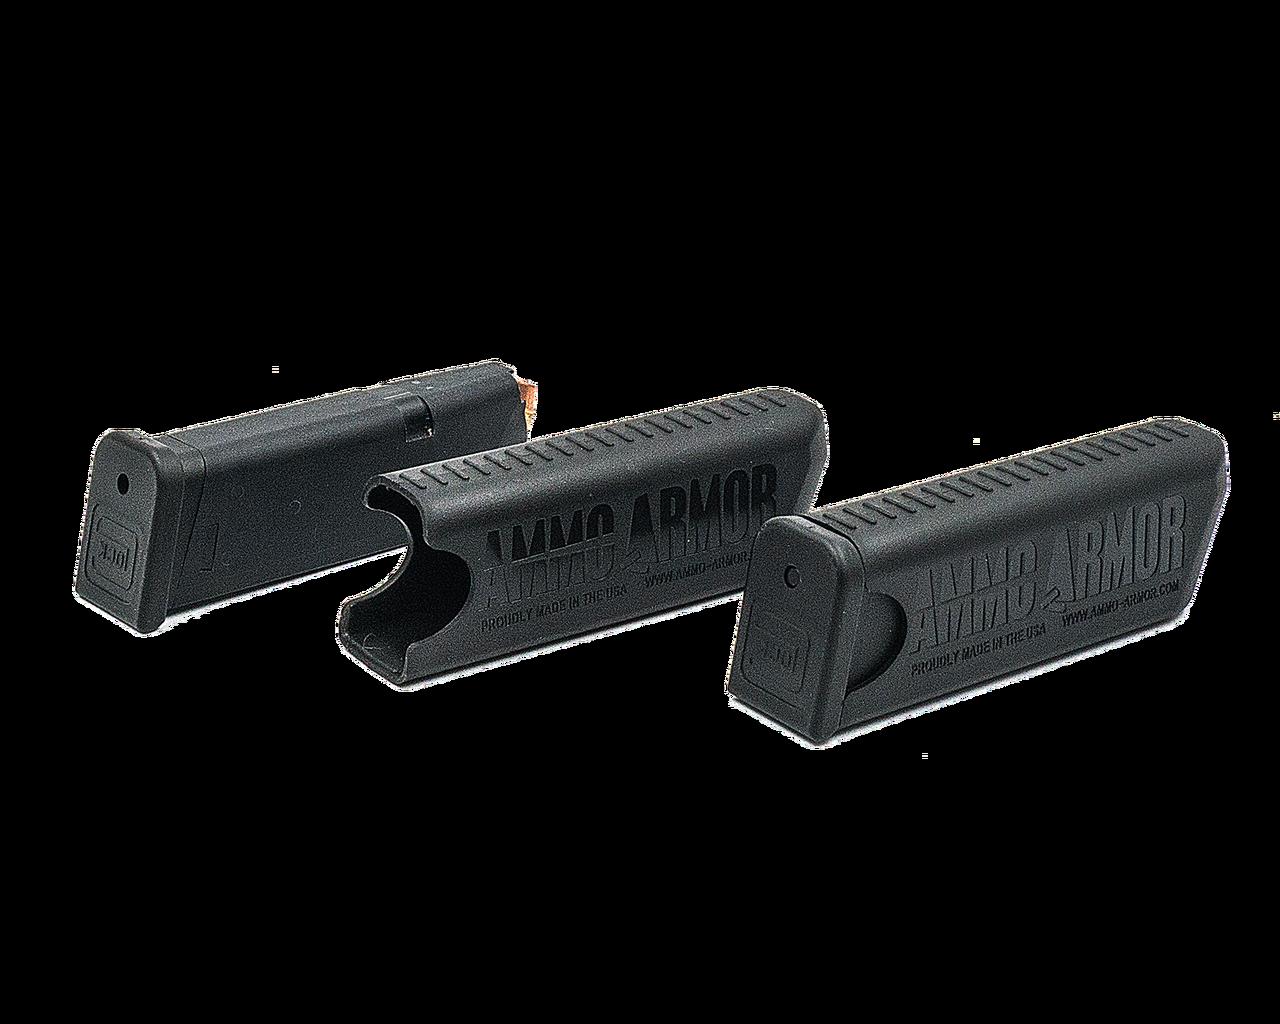 Springfield XD9sc Ammo Armor